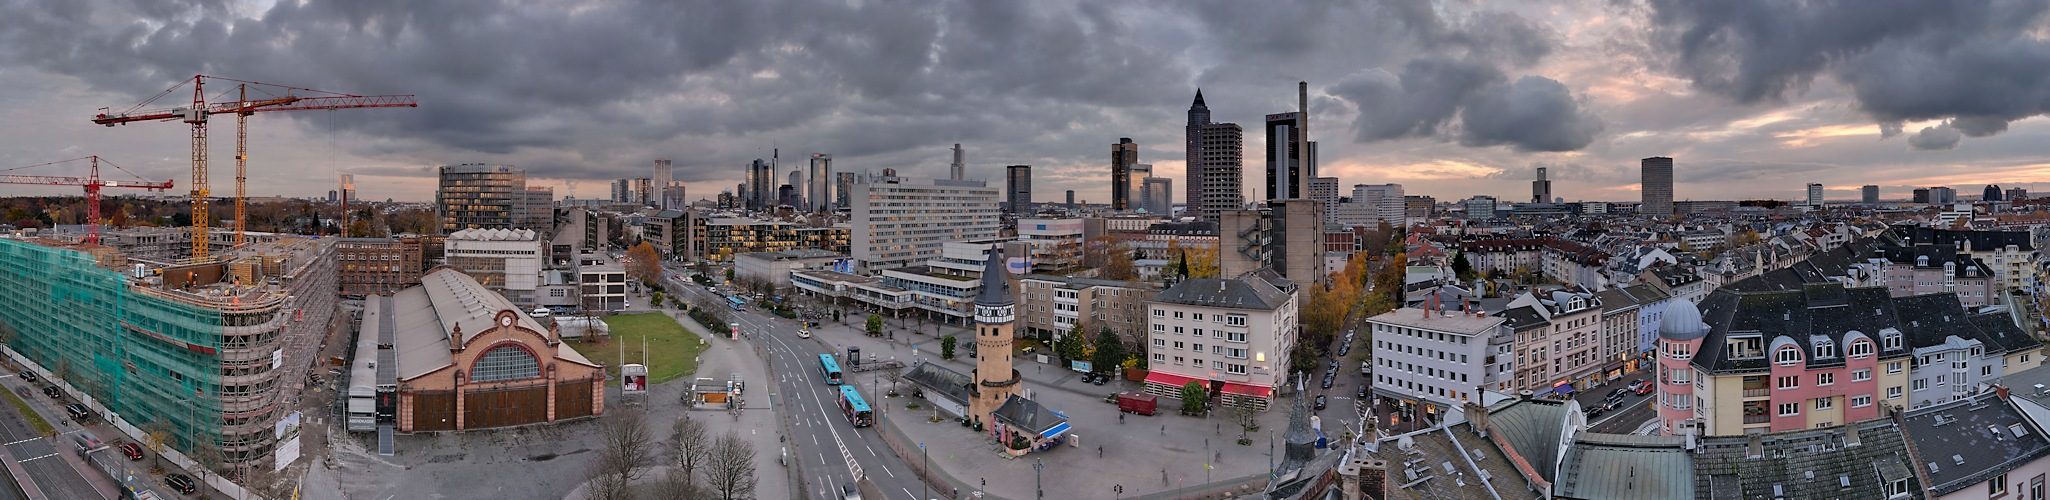 Novembergrau über Frankfurt